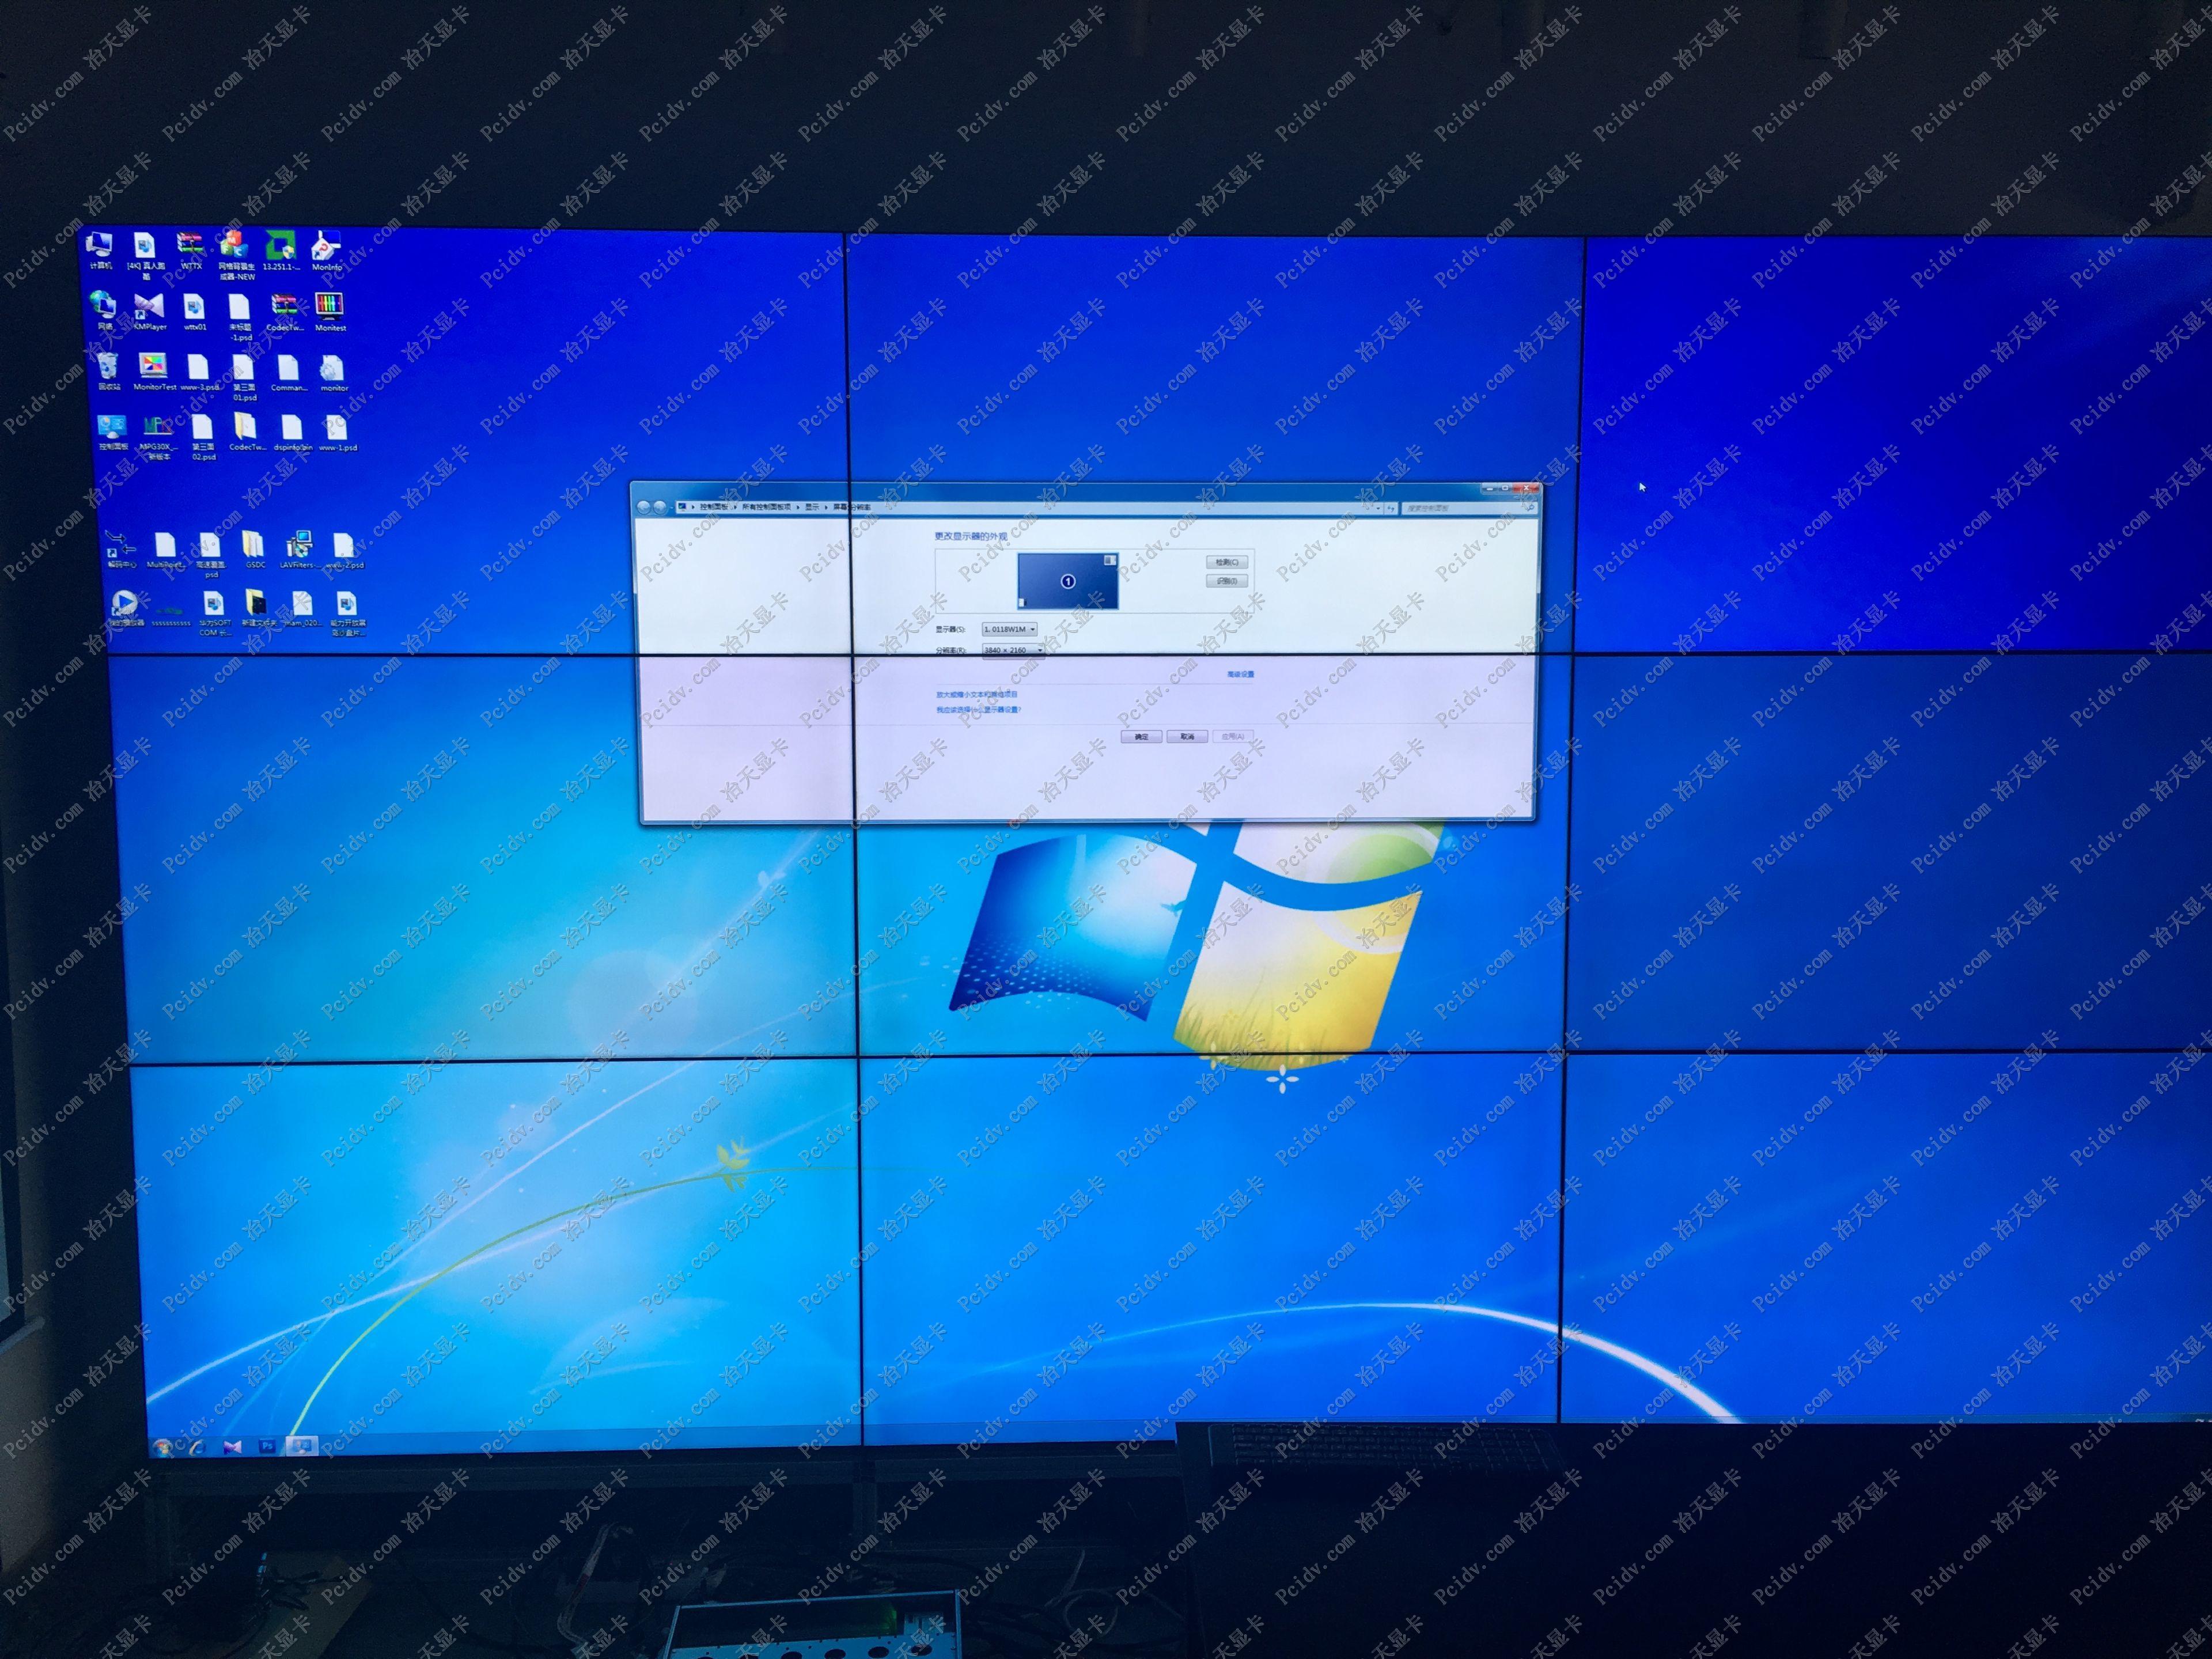 pcidv.com/9屏拼接4K电视3*3拼接墙3840*2160